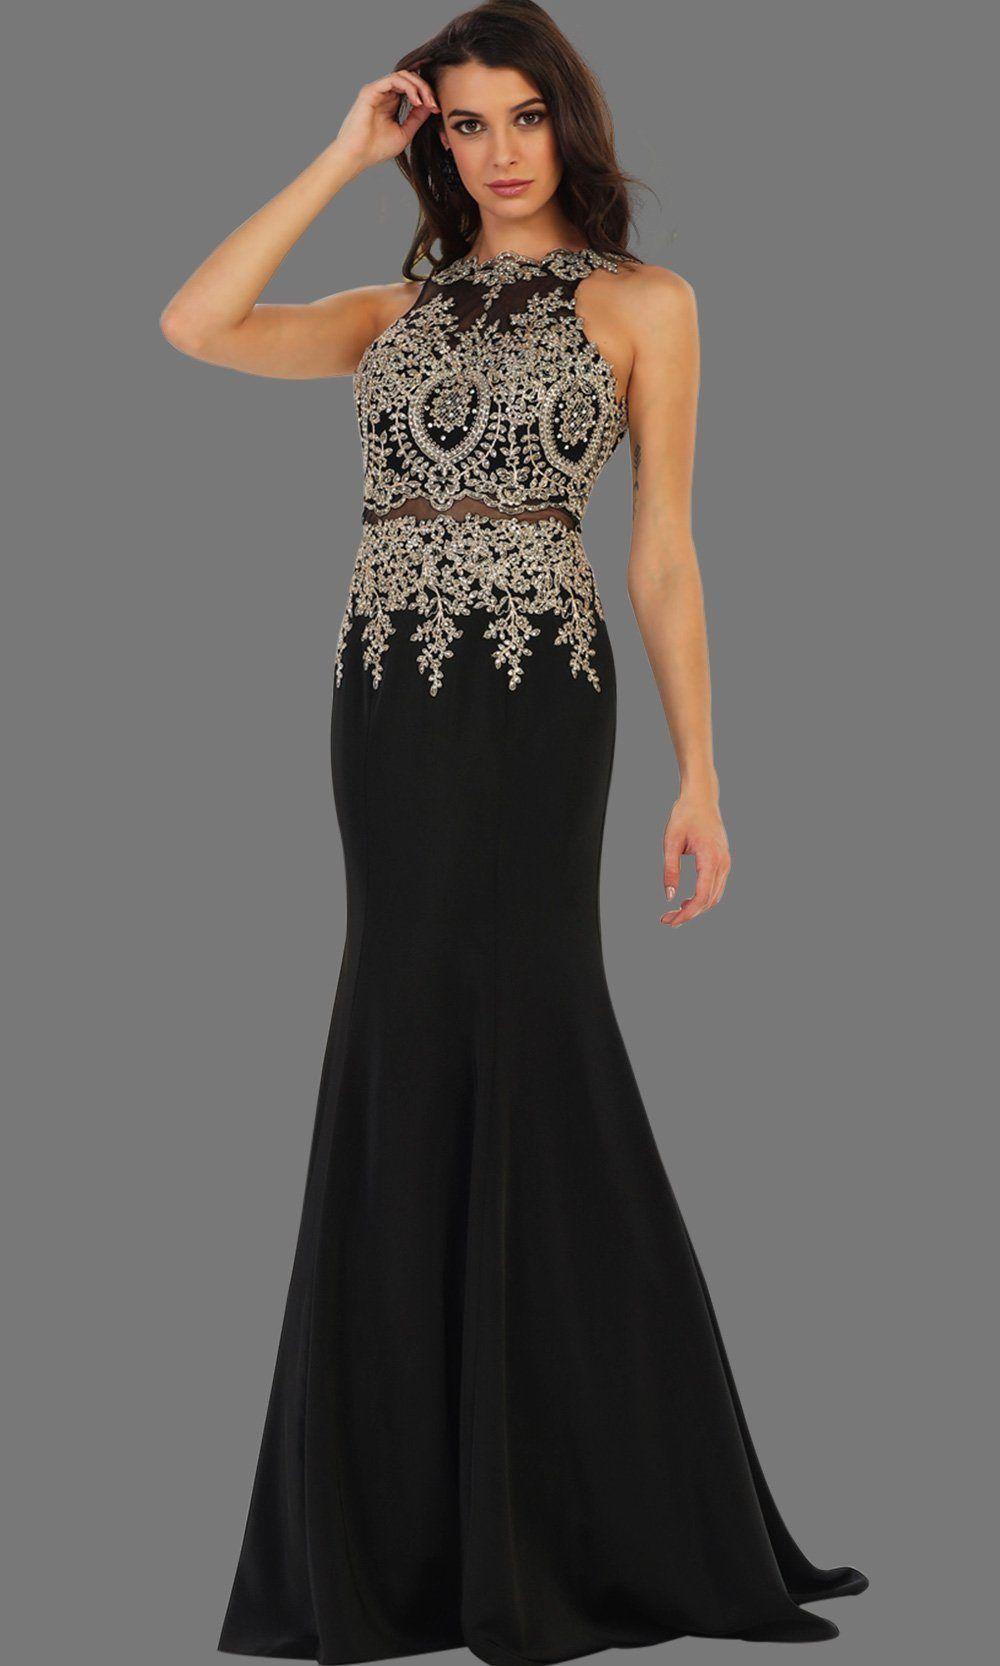 May Queen Rq7484 Mermaid Taffeta Dress Plus Size Wedding Guest Dresses Dresses Long Mermaid Dress [ 1666 x 1000 Pixel ]